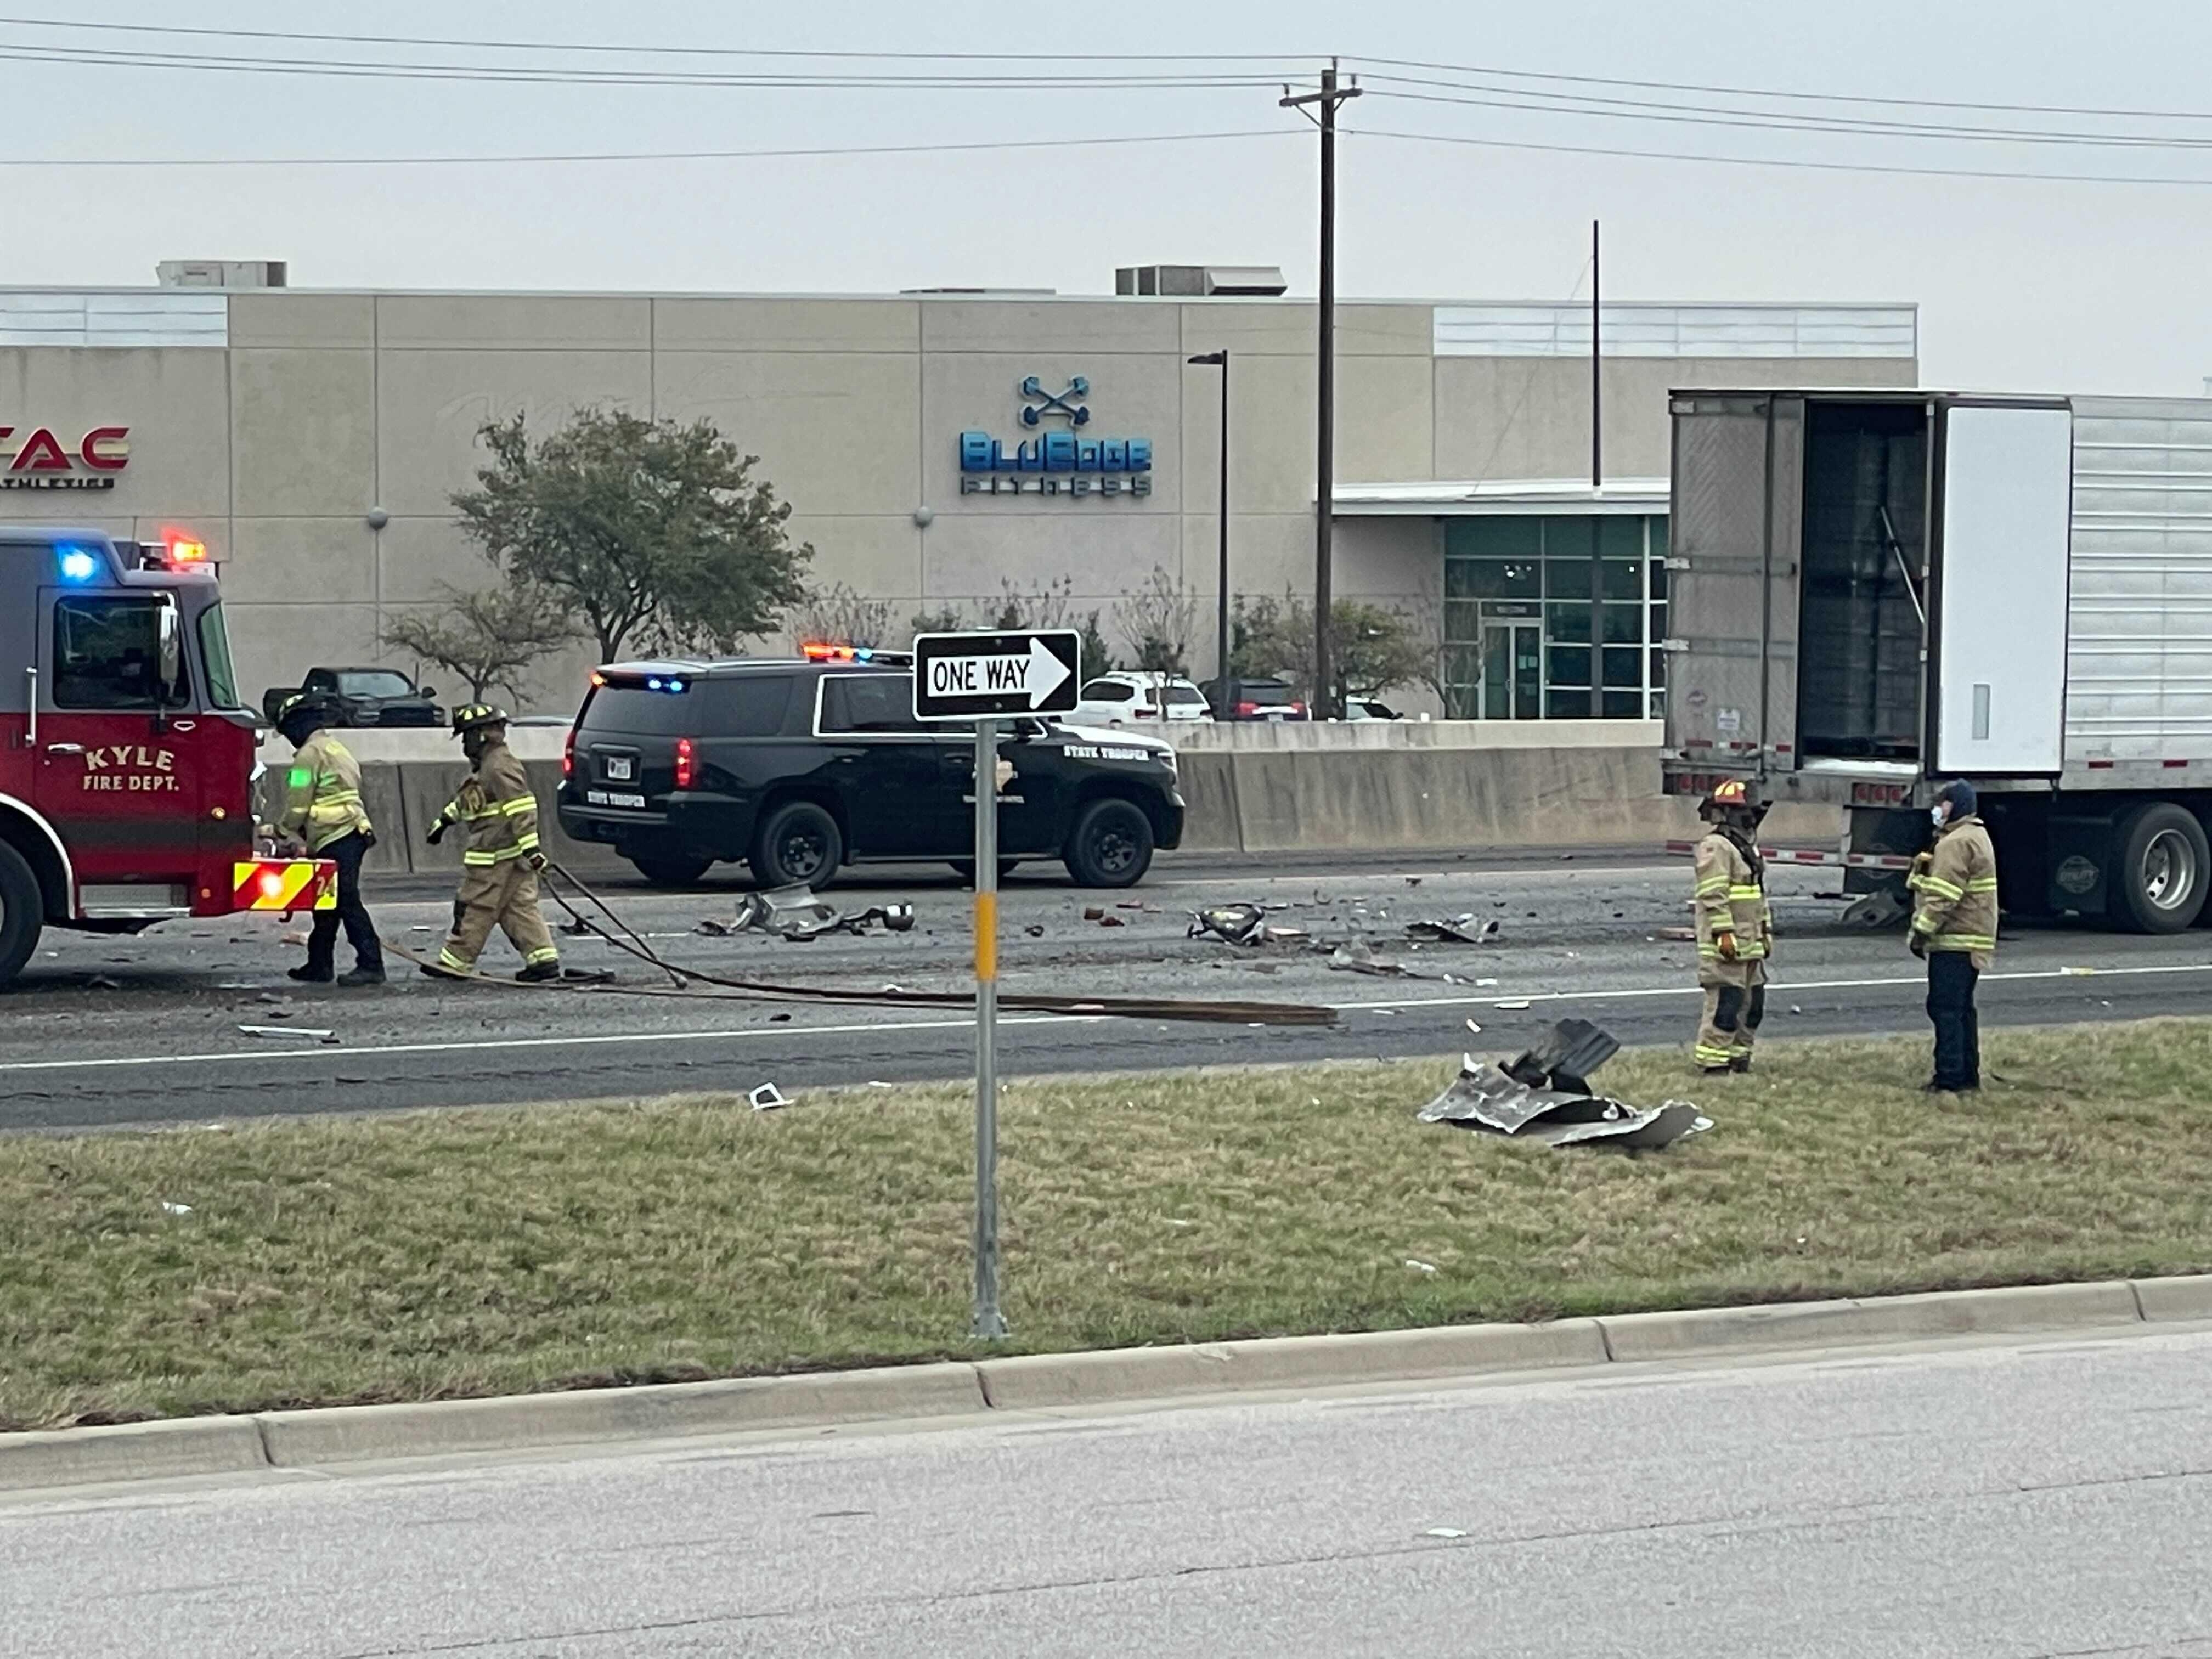 Two semis and a car were involved in a crash that shut down I-35 near Kyle Feb. 12, 2021 (KXAN Photo/Nick Bannin)